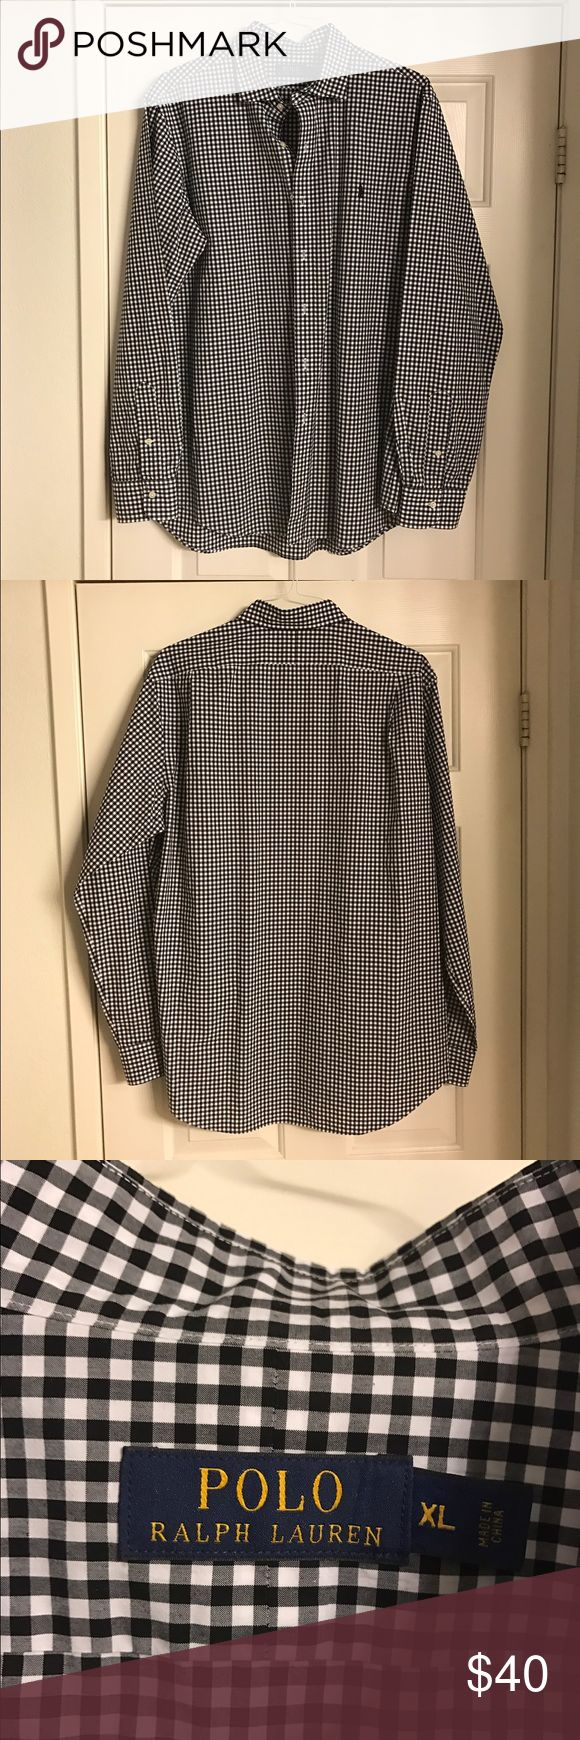 Polo Ralph Lauren Men's Shirt Polo Ralph Lauren black and white checkered shirt with black polo horse logo, XL Polo by Ralph Lauren Shirts Dress Shirts